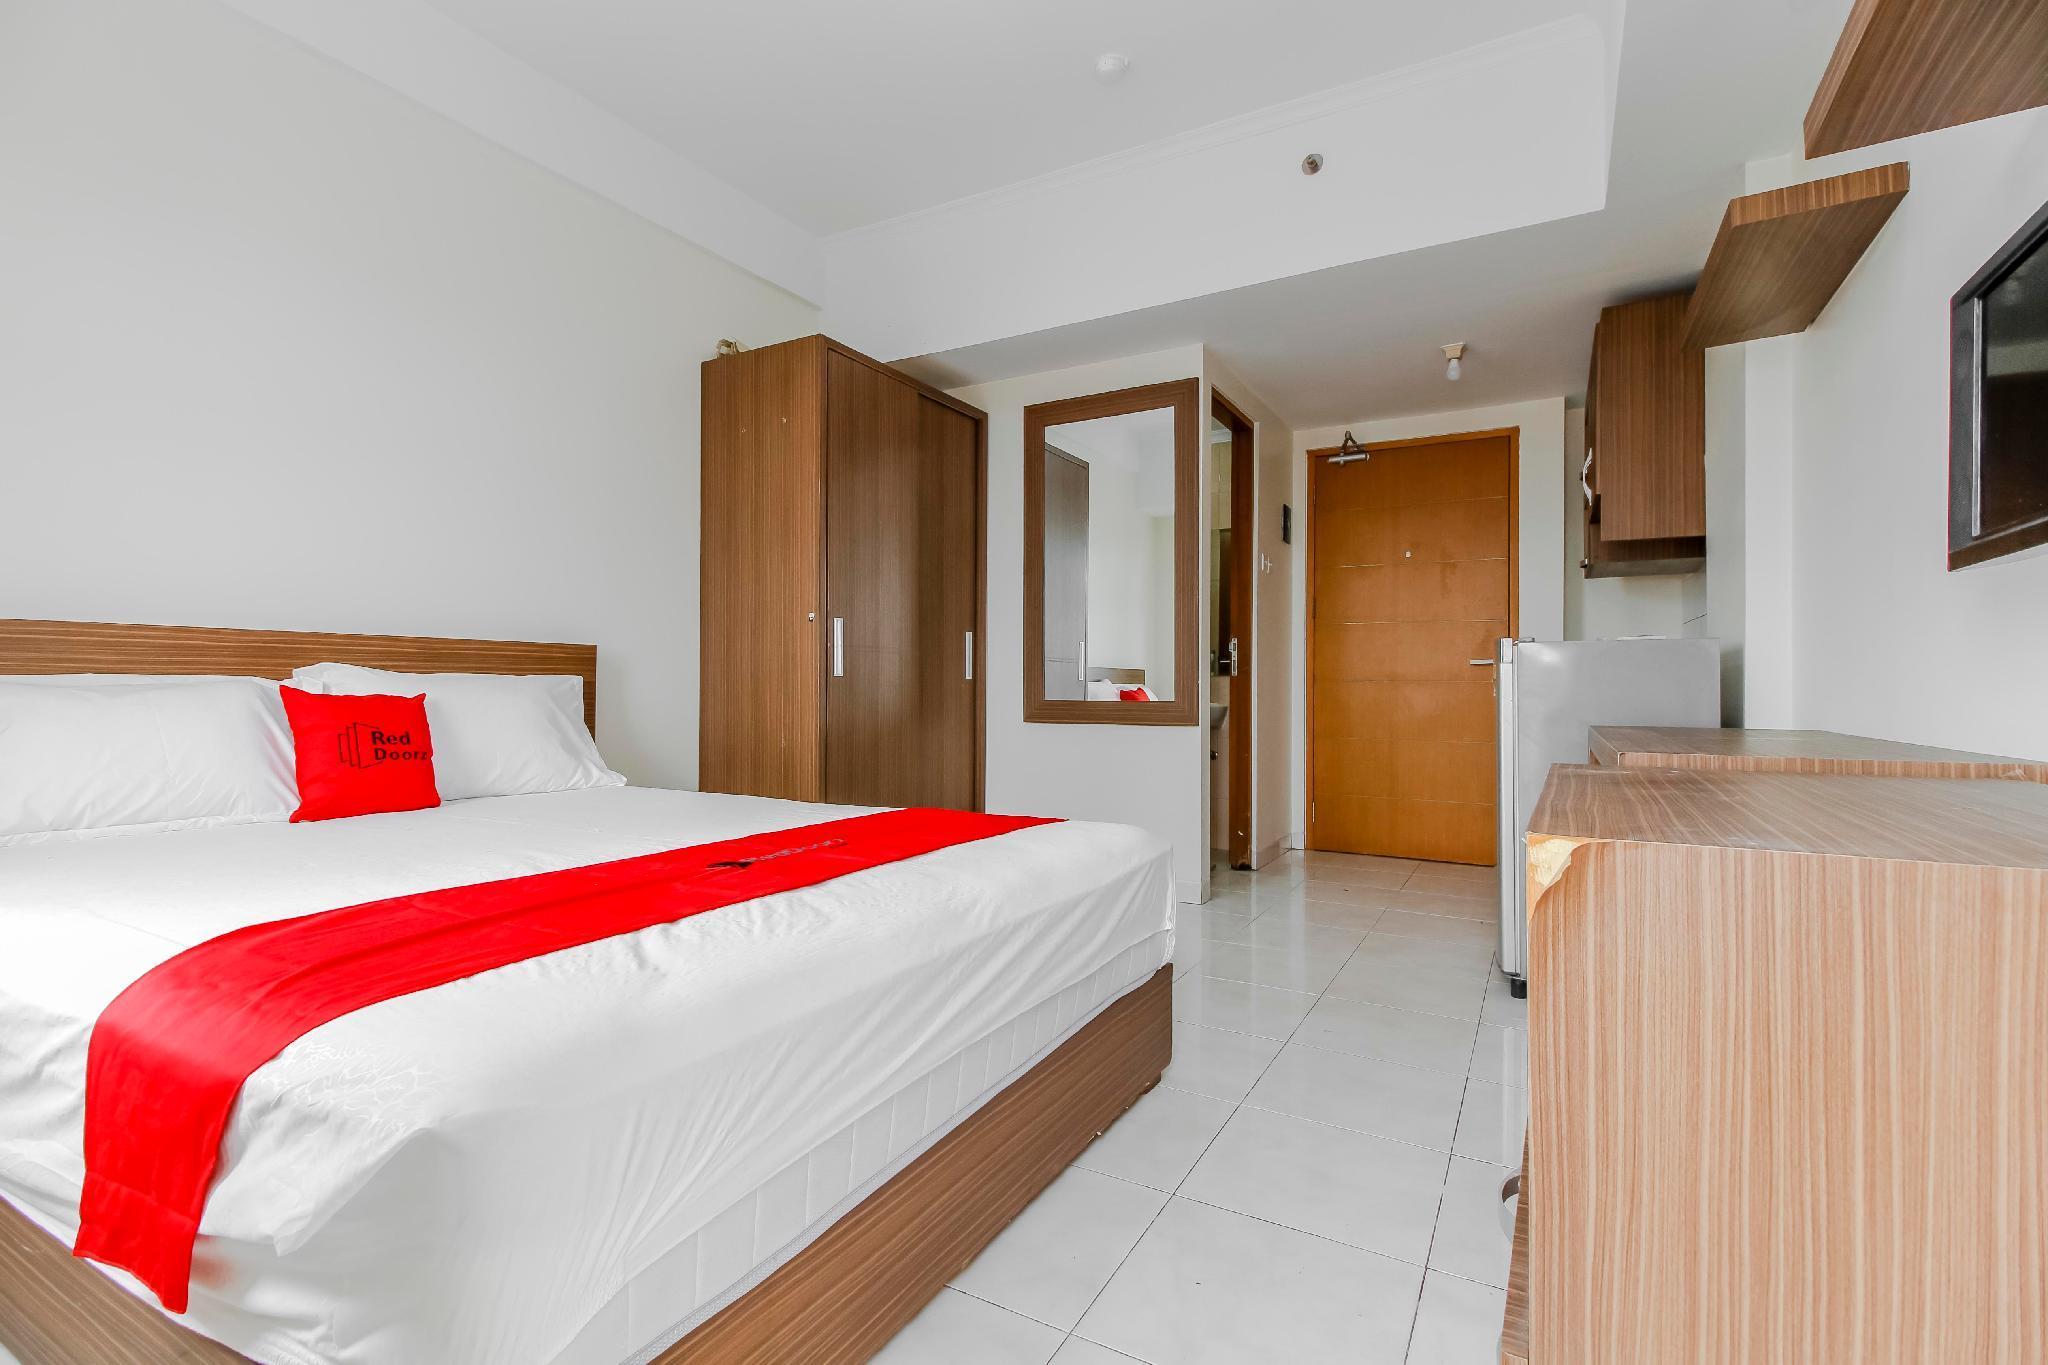 RedDoorz @ Apartement Margonda Residence Tower 2, Depok